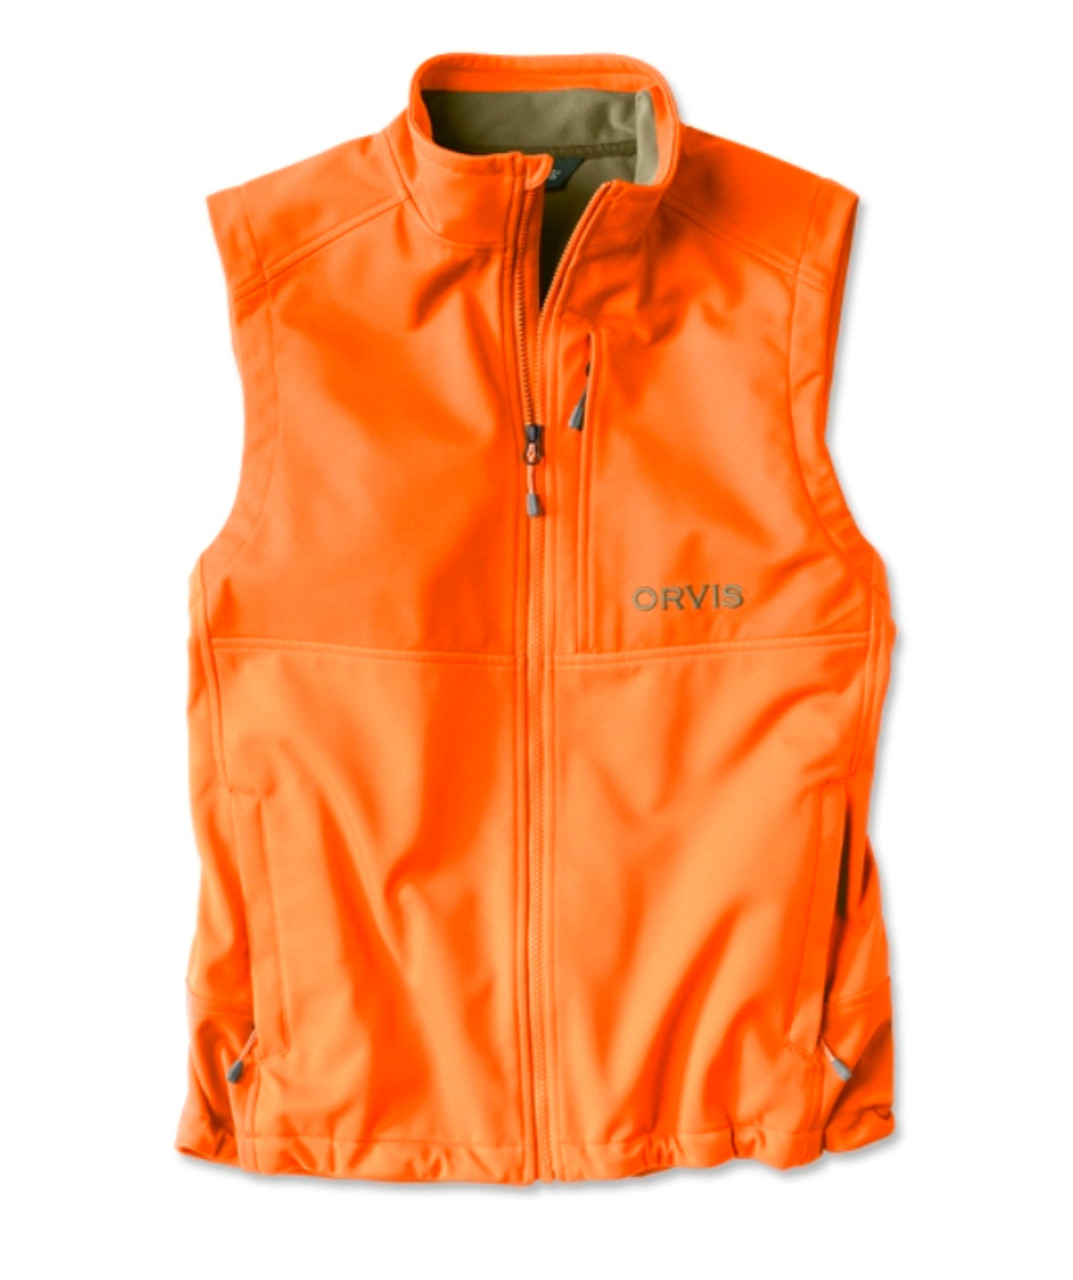 Orvis Men's Softshell Upland Hunting Vest 2P6F